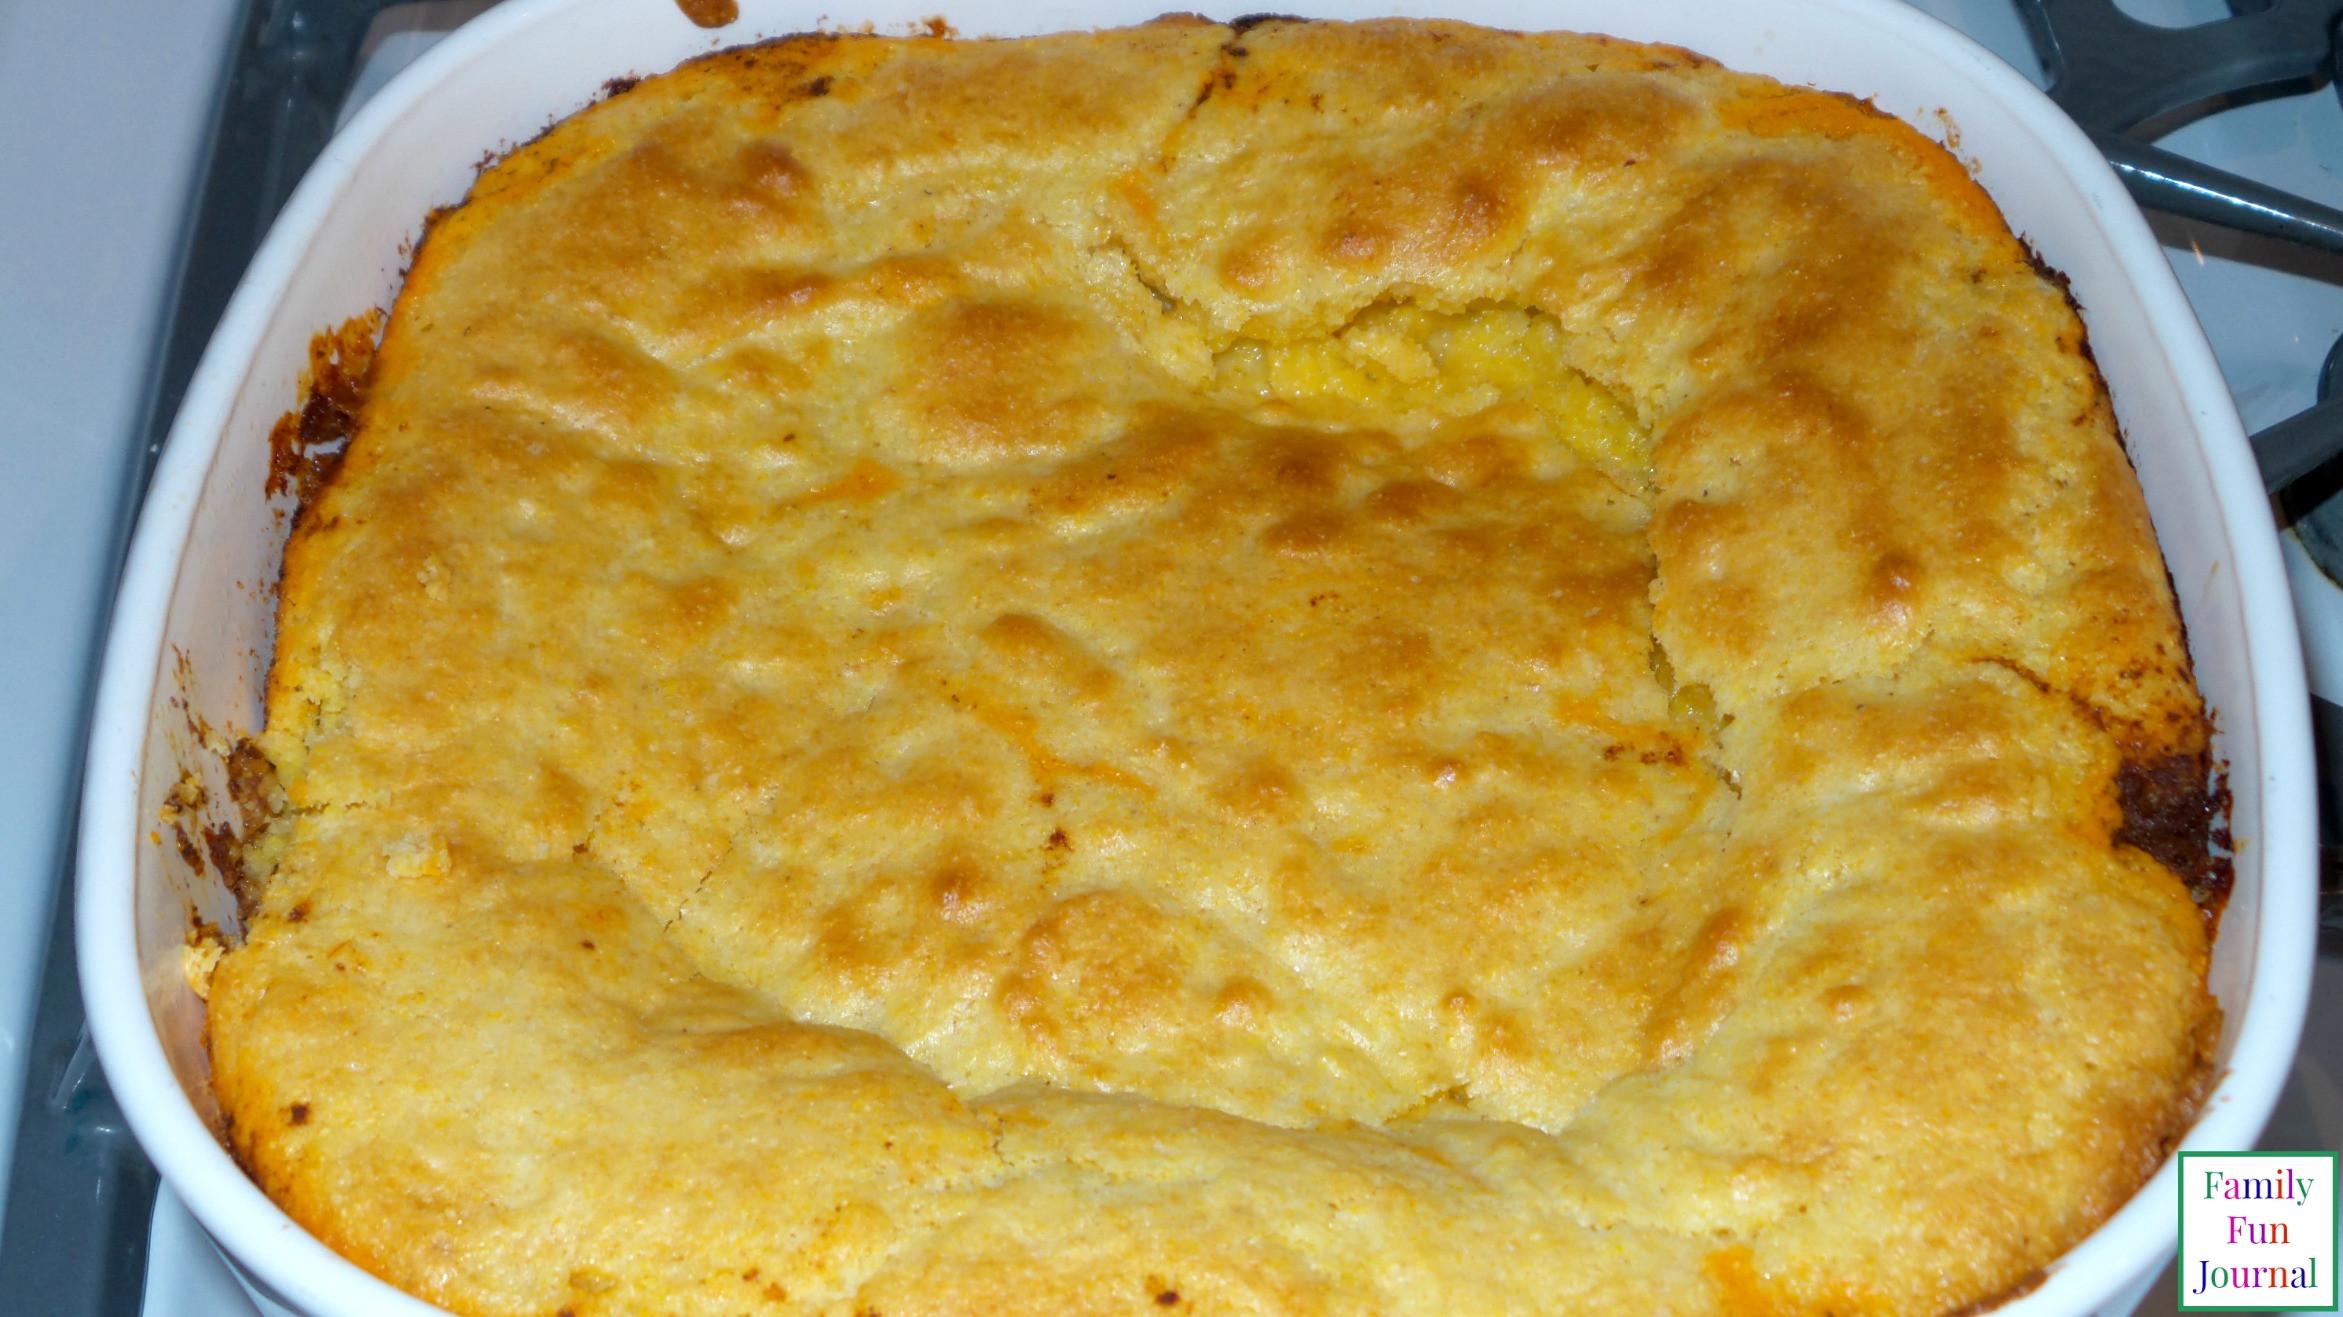 Chili Cornbread Casserole  Chili Cornbread Casserole Family Fun Journal